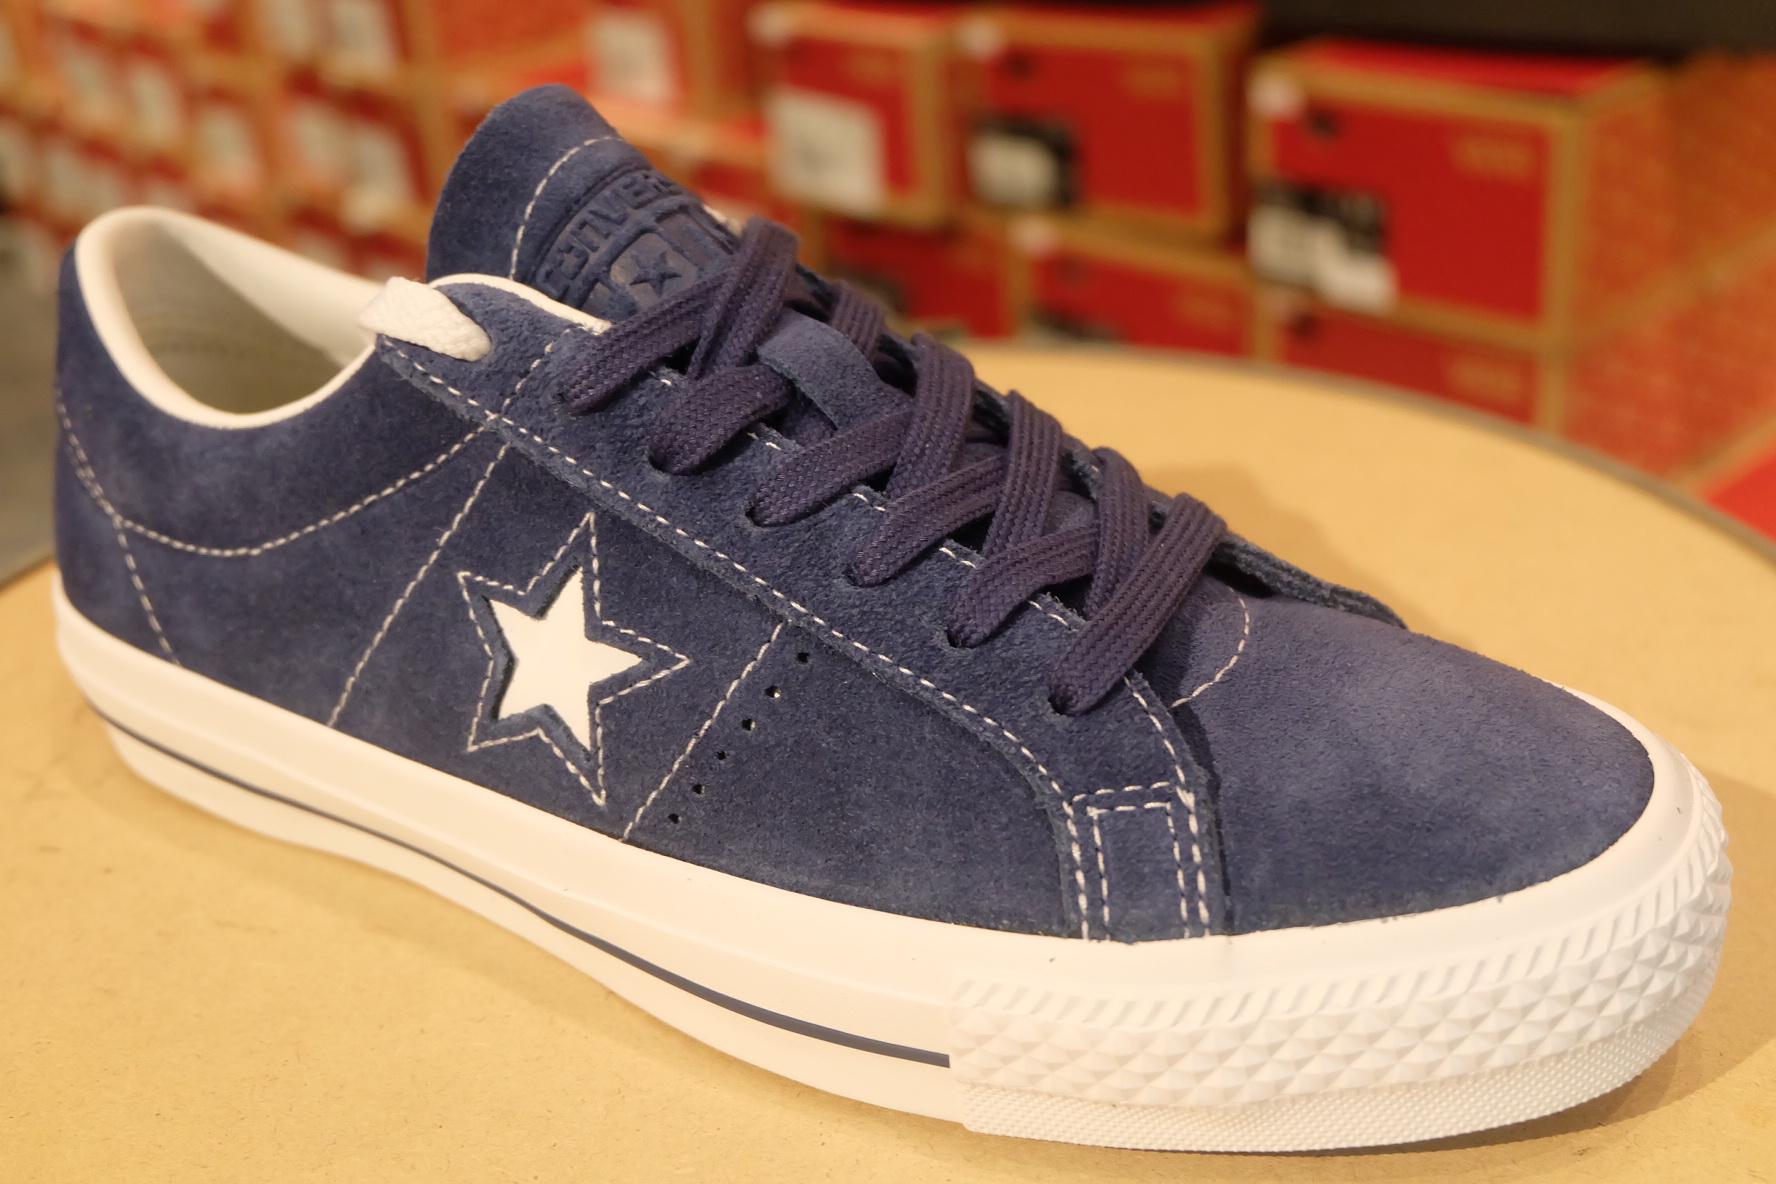 converse one star 3500